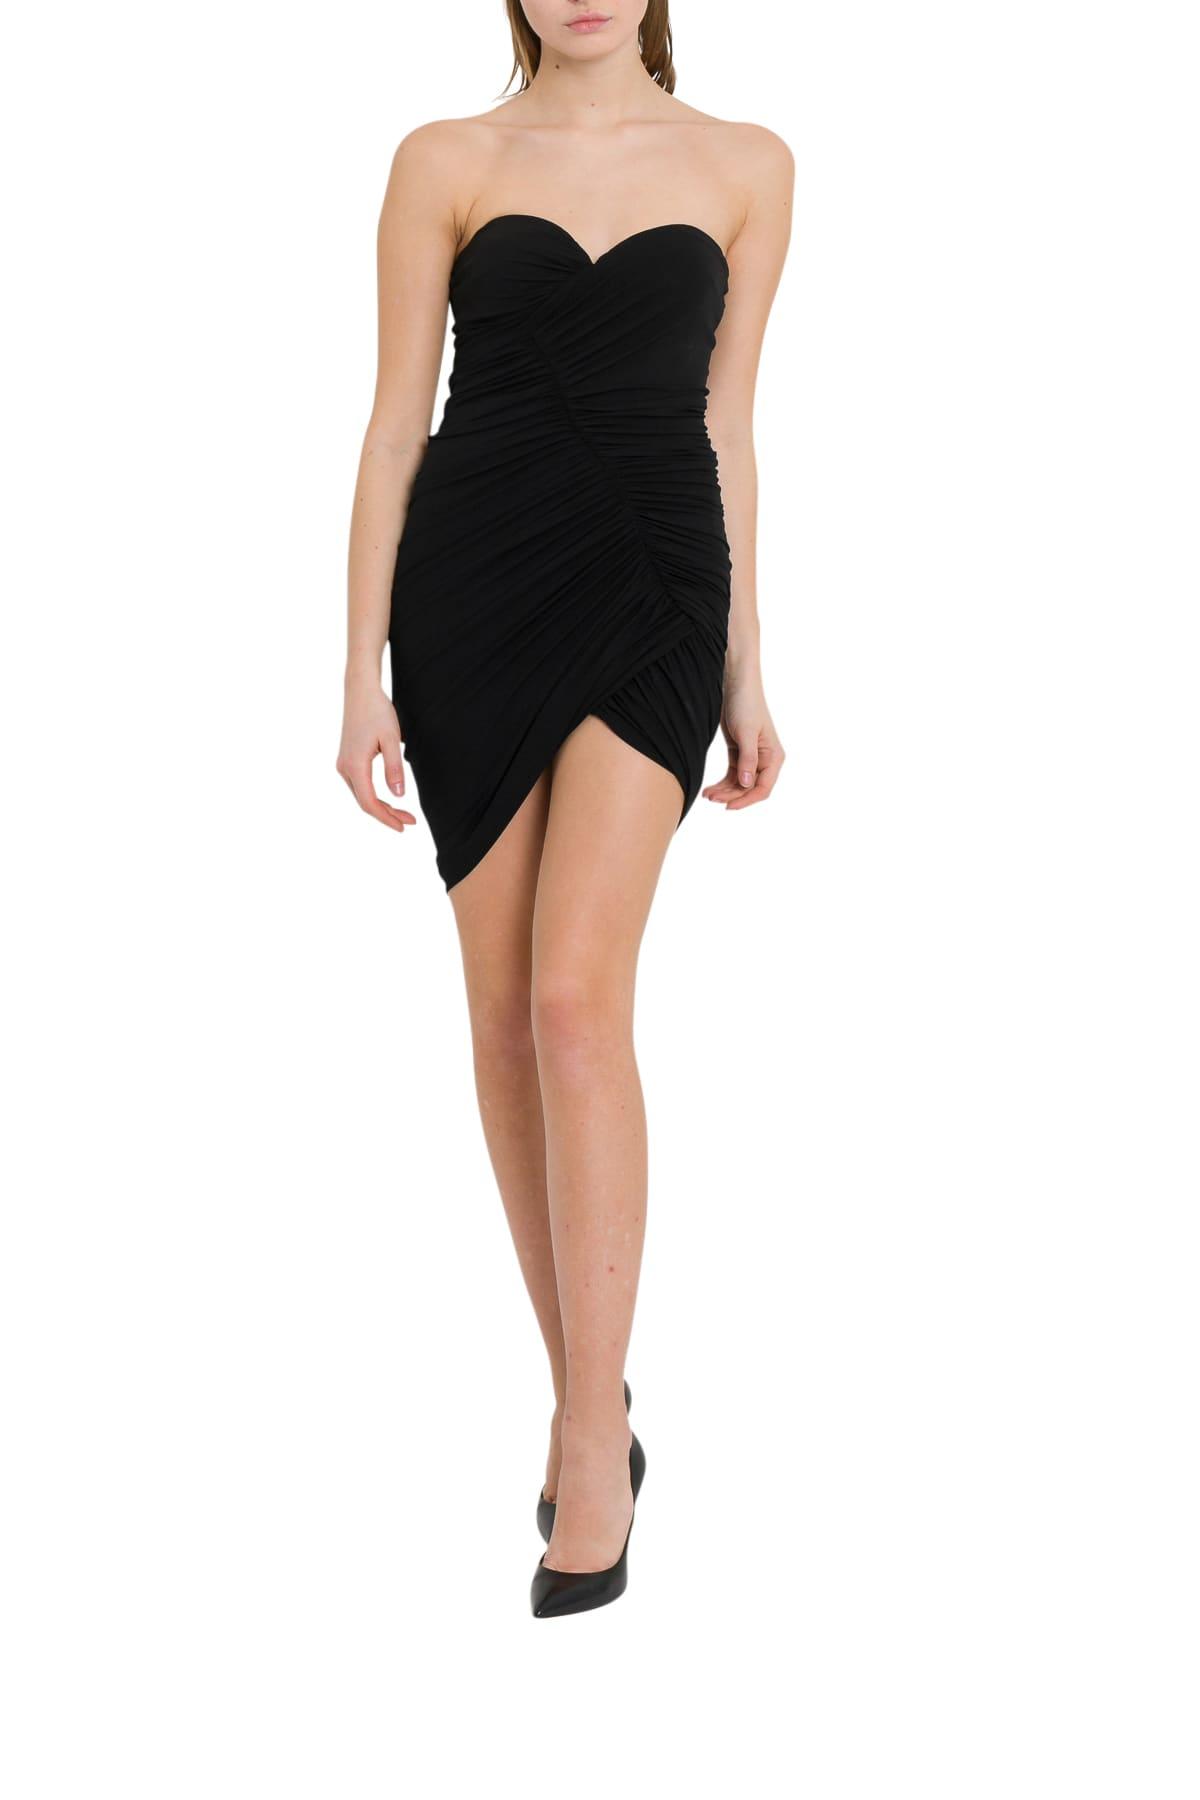 Photo of  Alexandre Vauthier Asymmetric Dress With Draping And Slit- shop Alexandre Vauthier  online sales